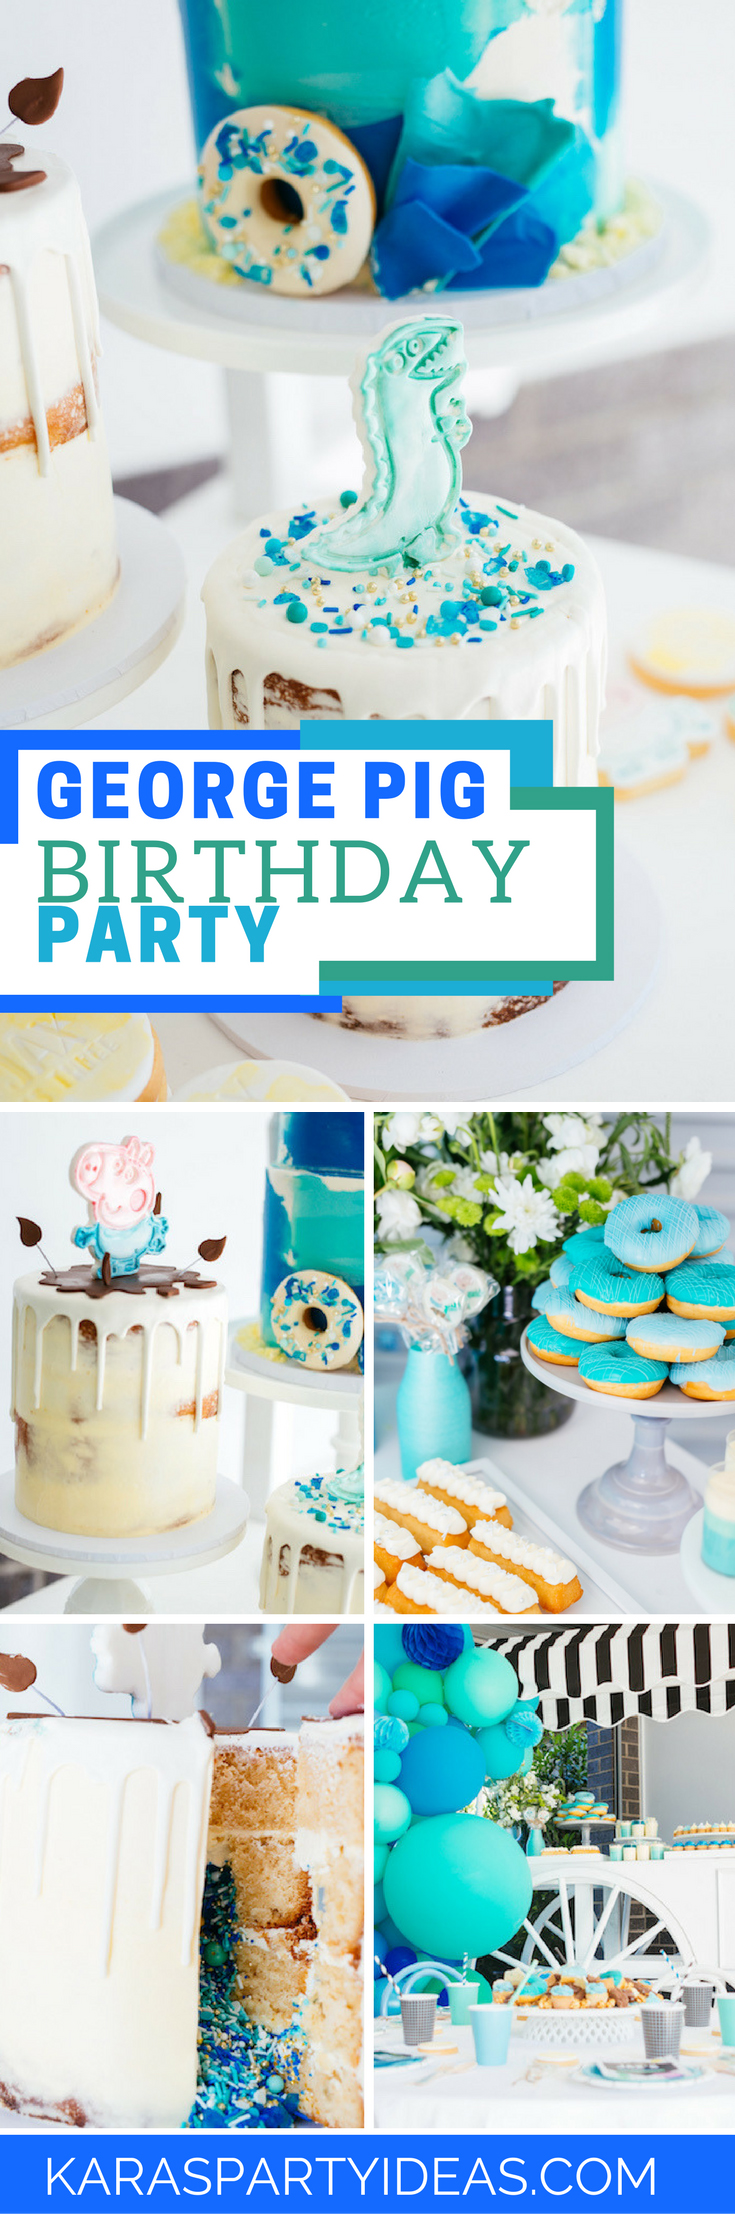 George Pig Birthday Party via Kara's Party Ideas - KarasPartyIdeas.com